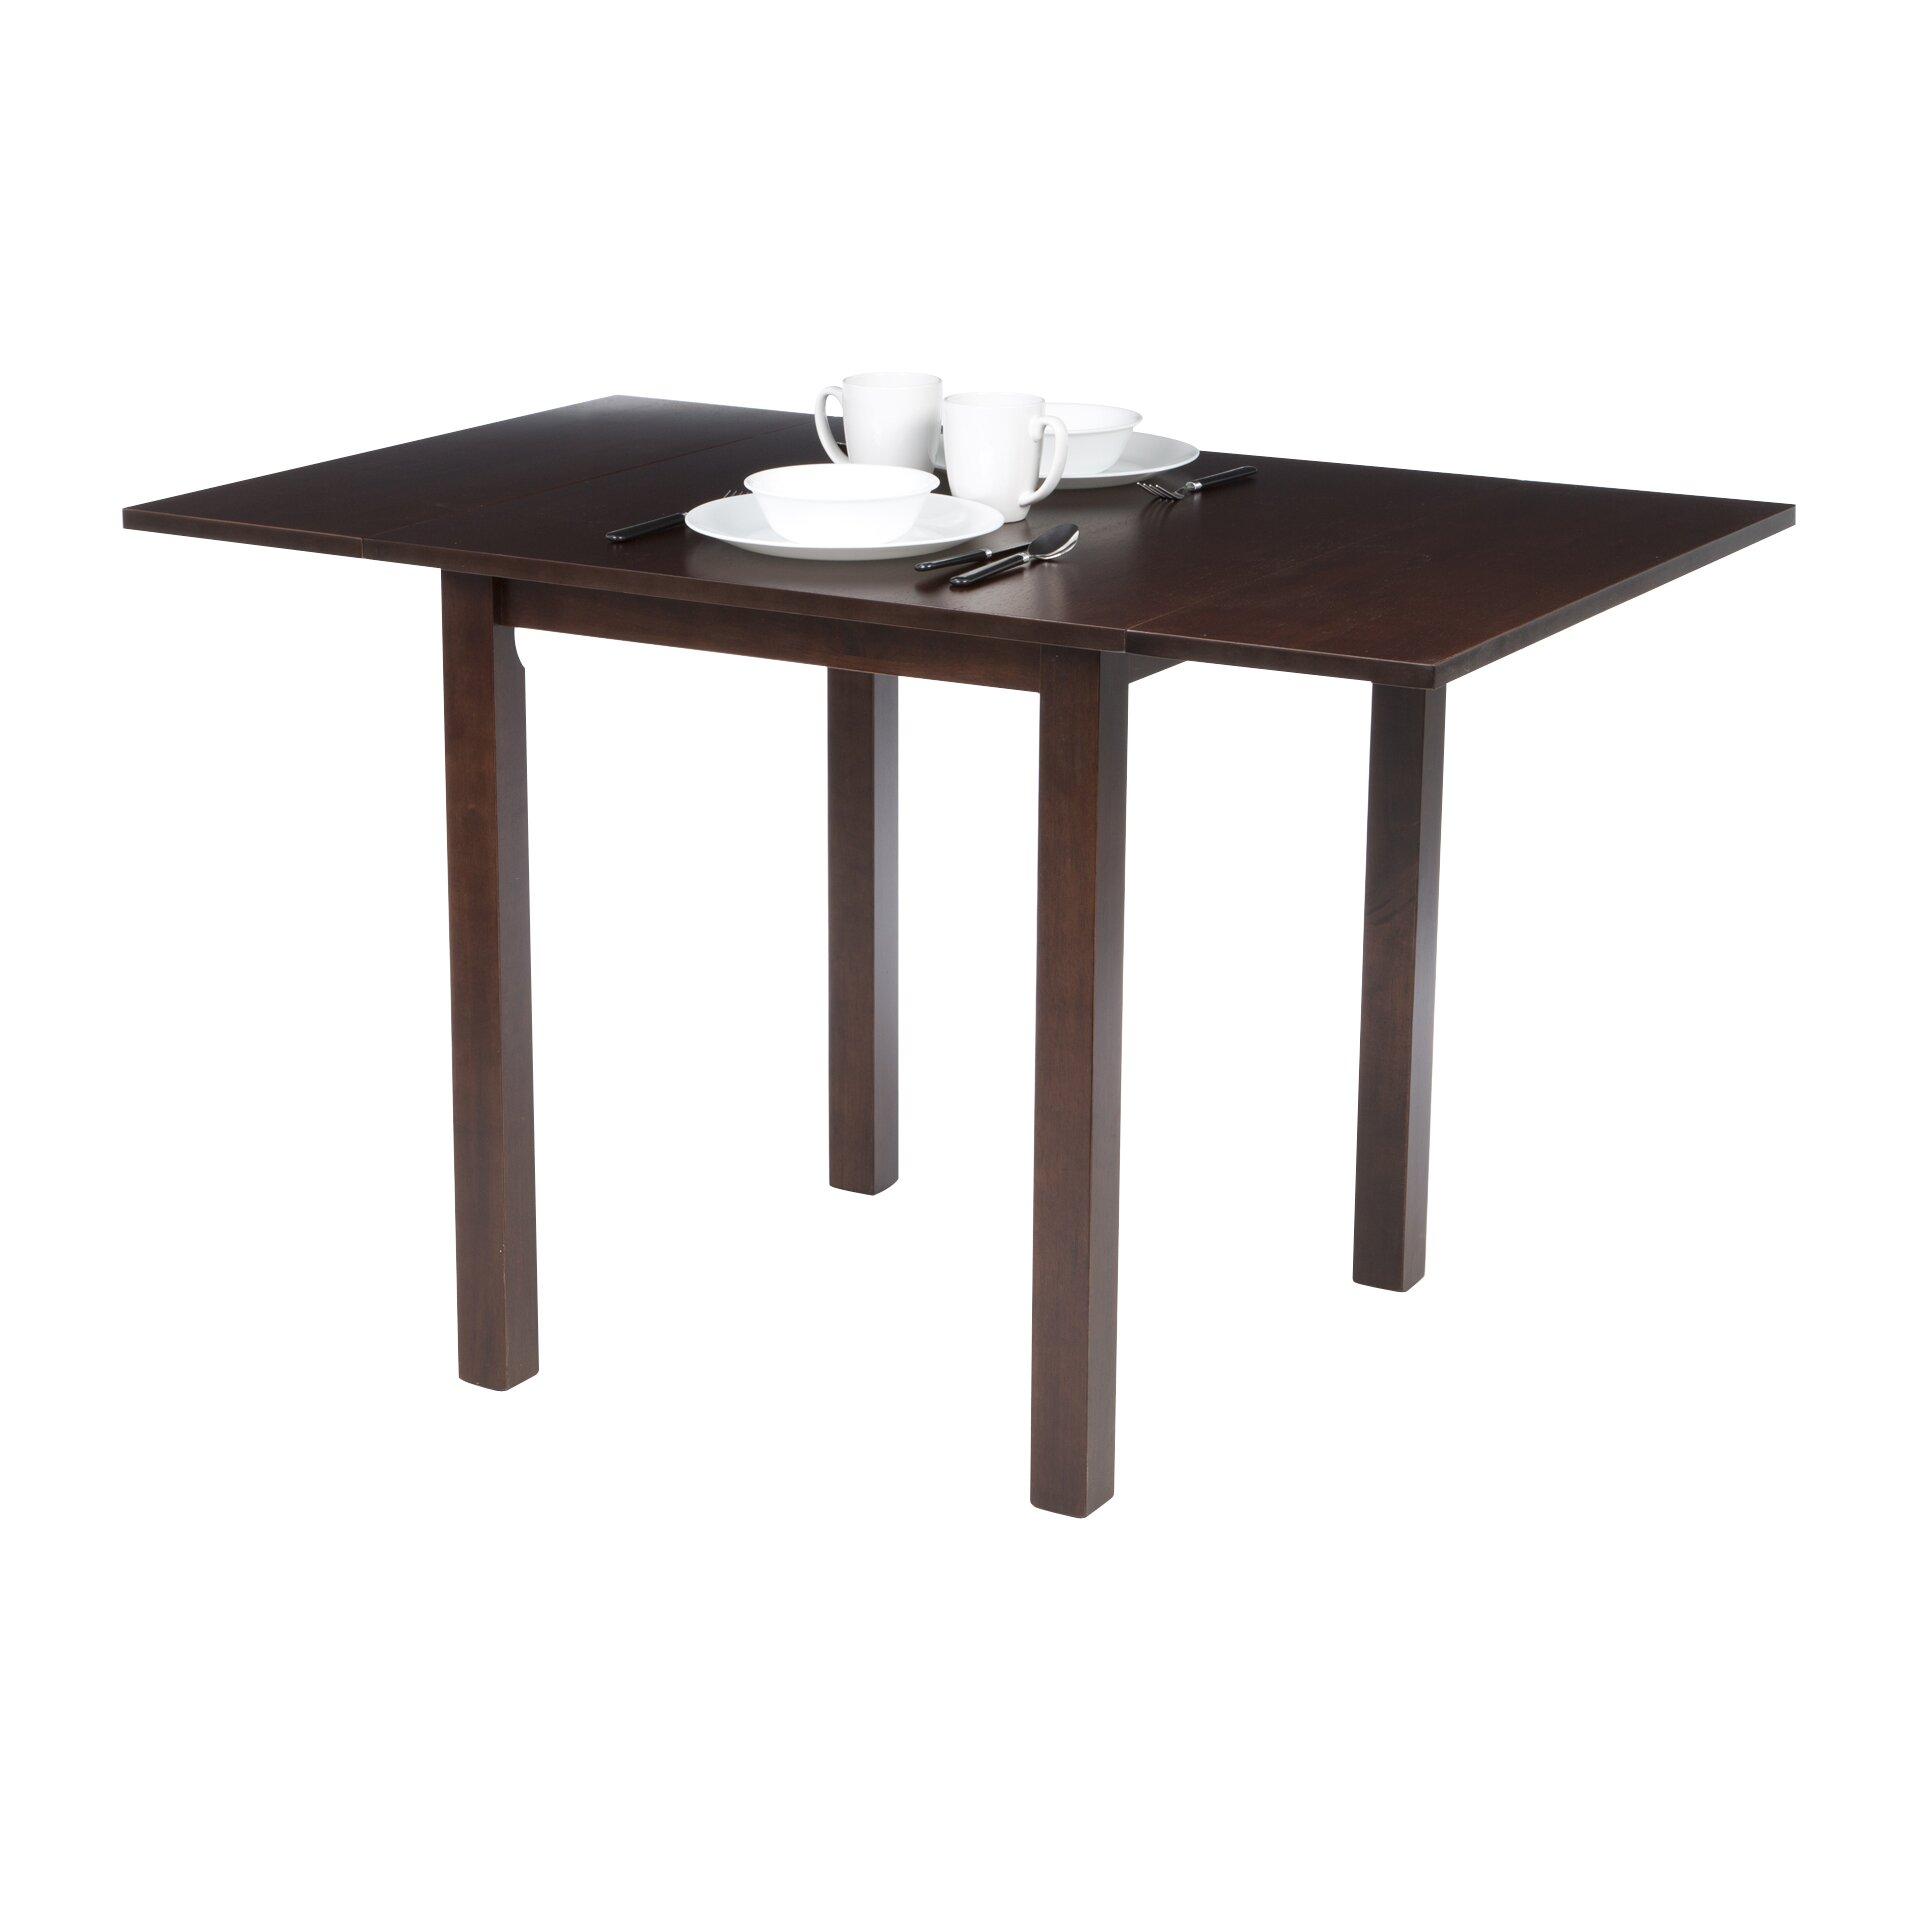 Zipcode Design Cathy Dining Table amp Reviews Wayfairca : Austin2BDining2BTable from www.wayfair.ca size 1920 x 1920 jpeg 146kB